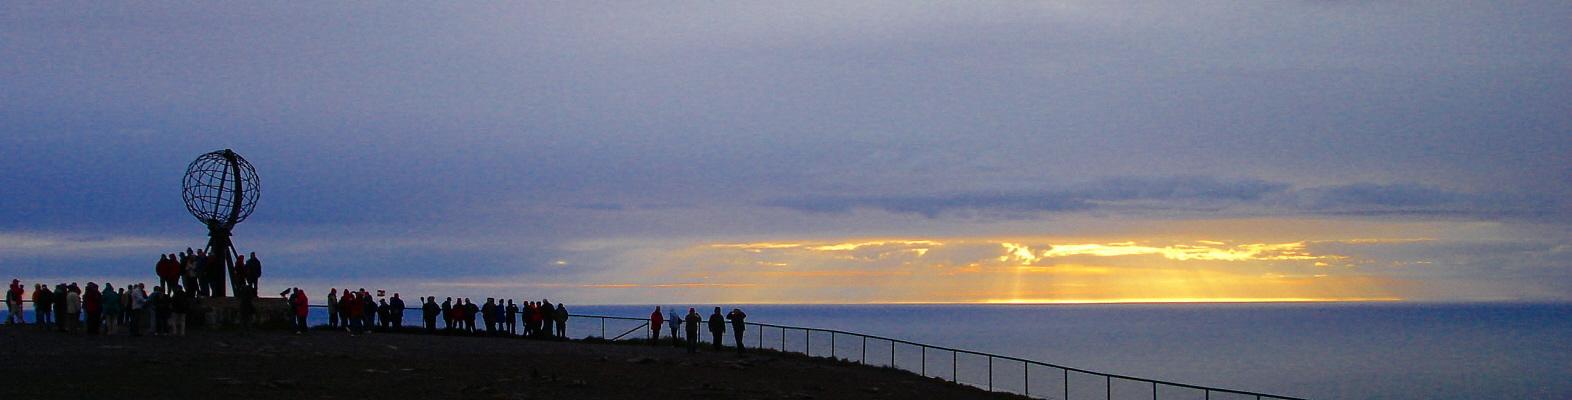 Nordkapp 2010.jpg